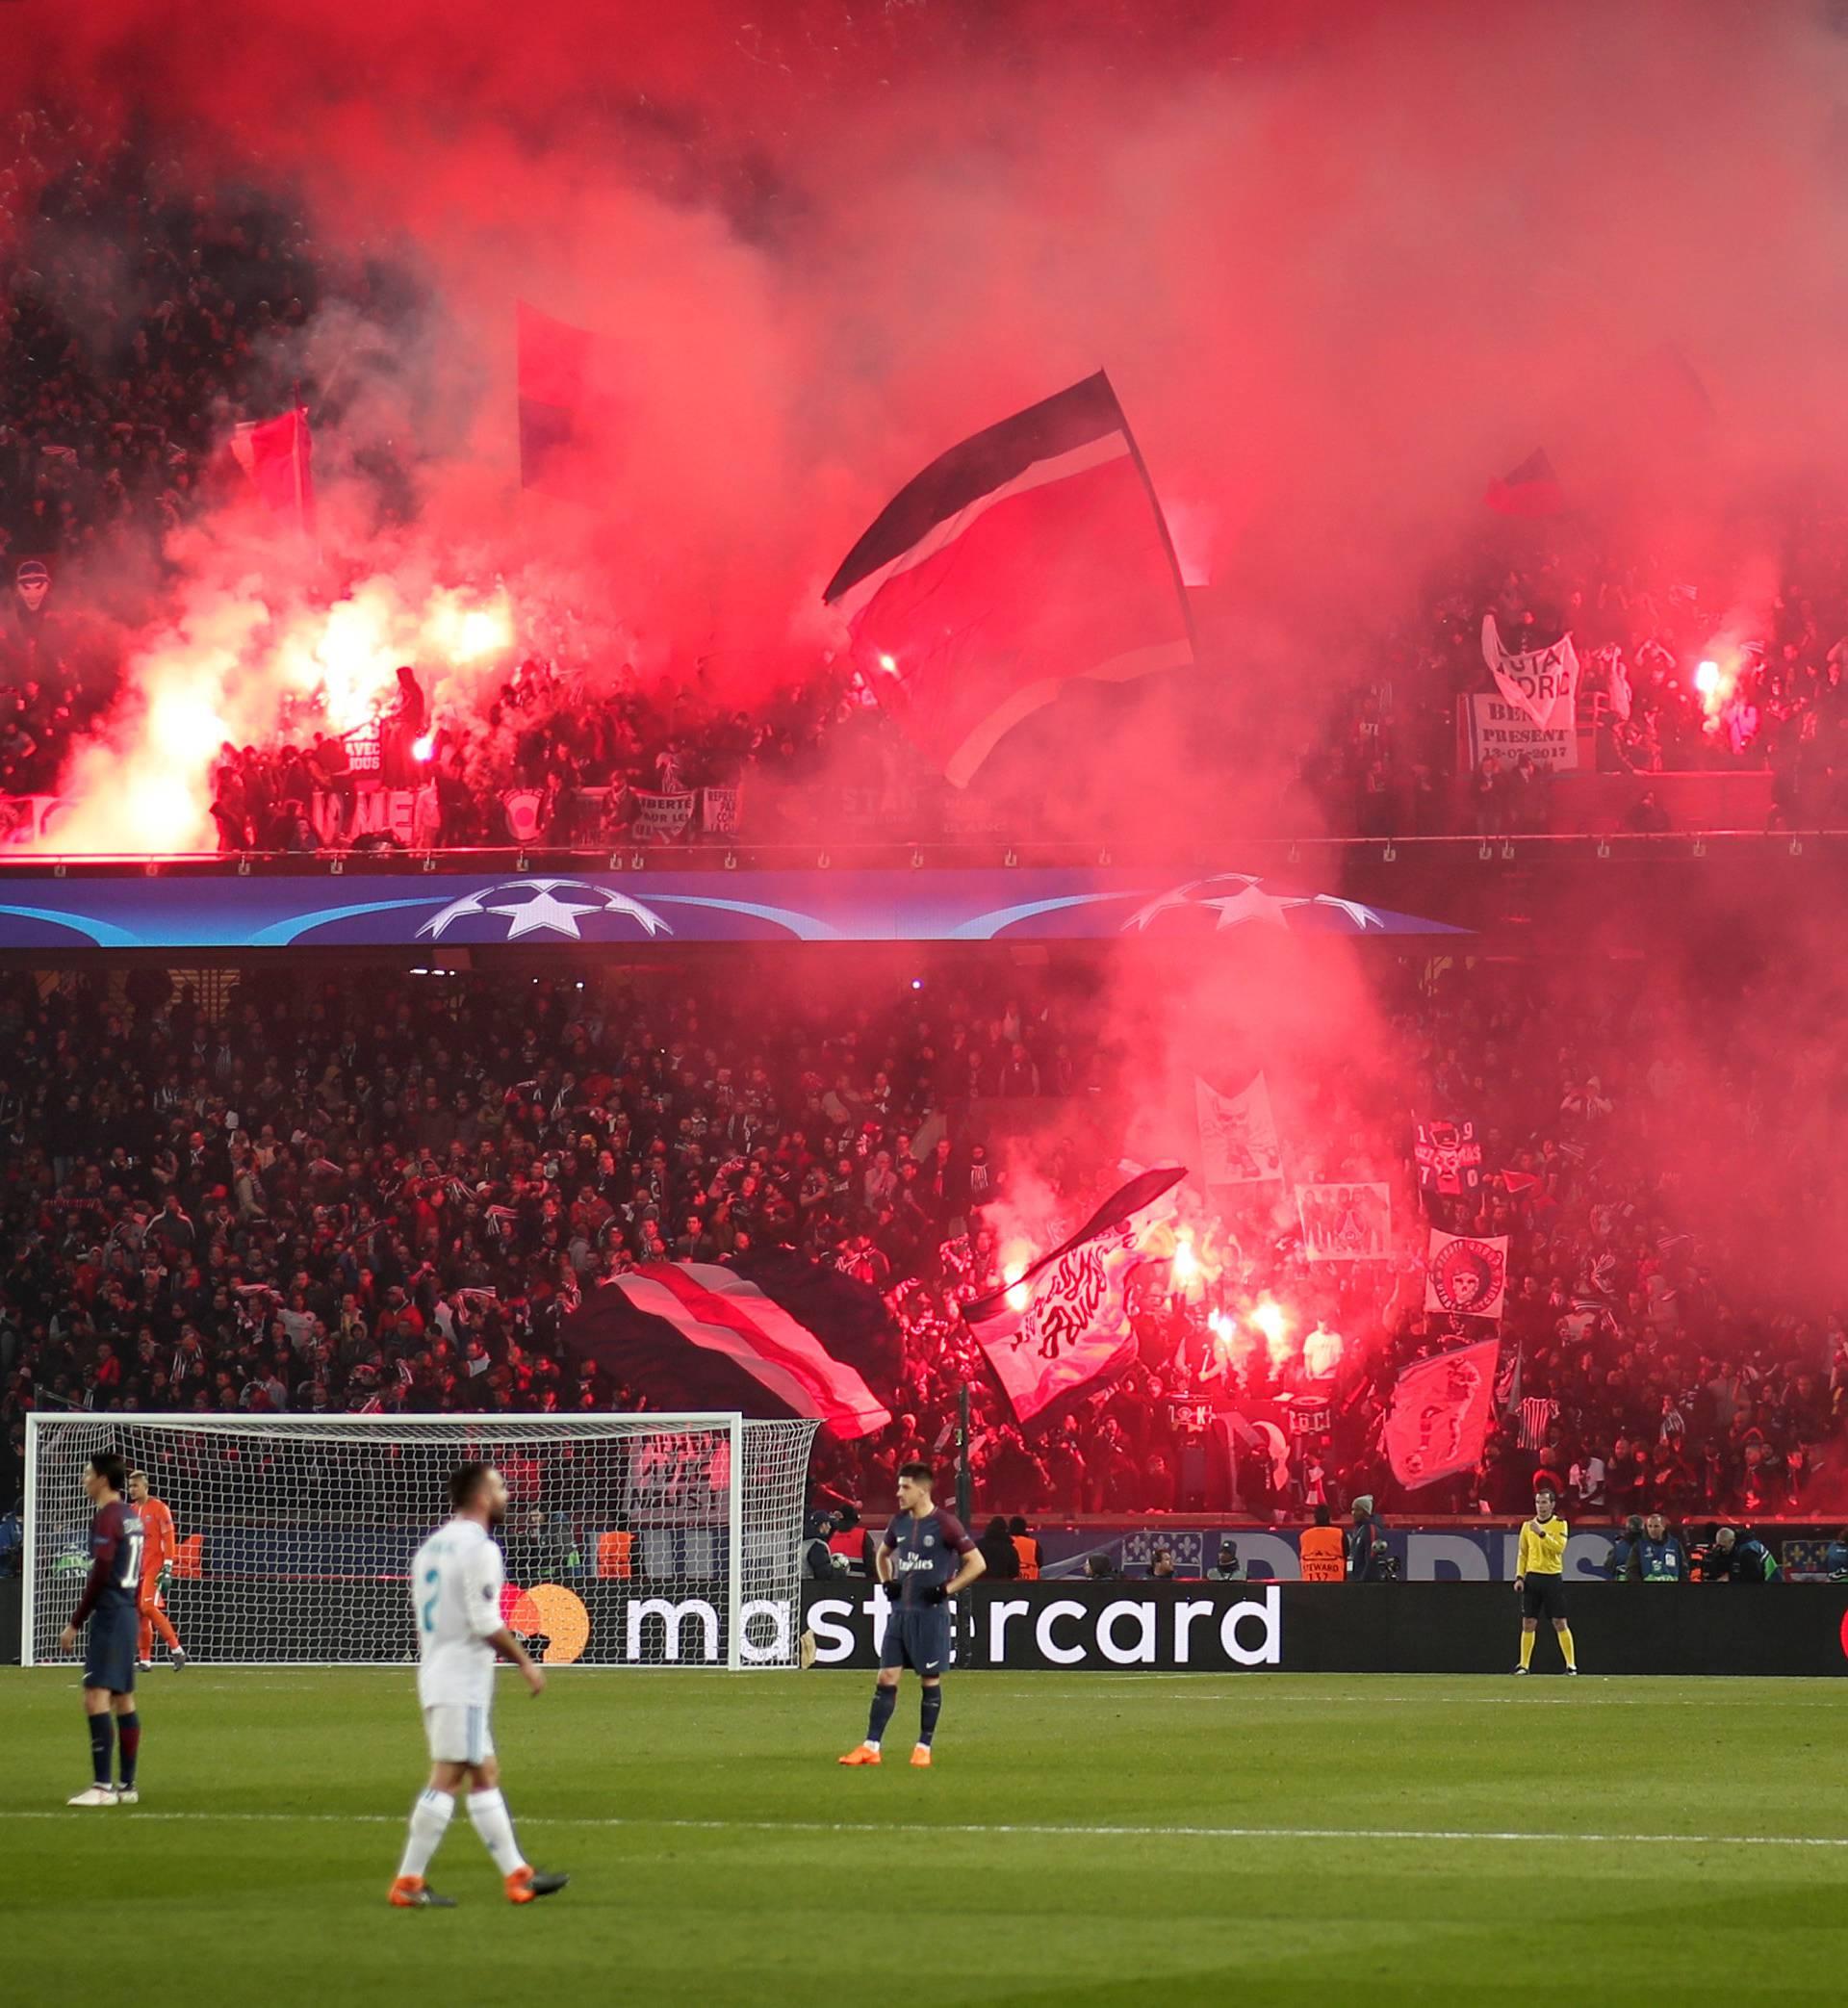 Champions League Round of 16 Second Leg - Paris St Germain vs Real Madrid